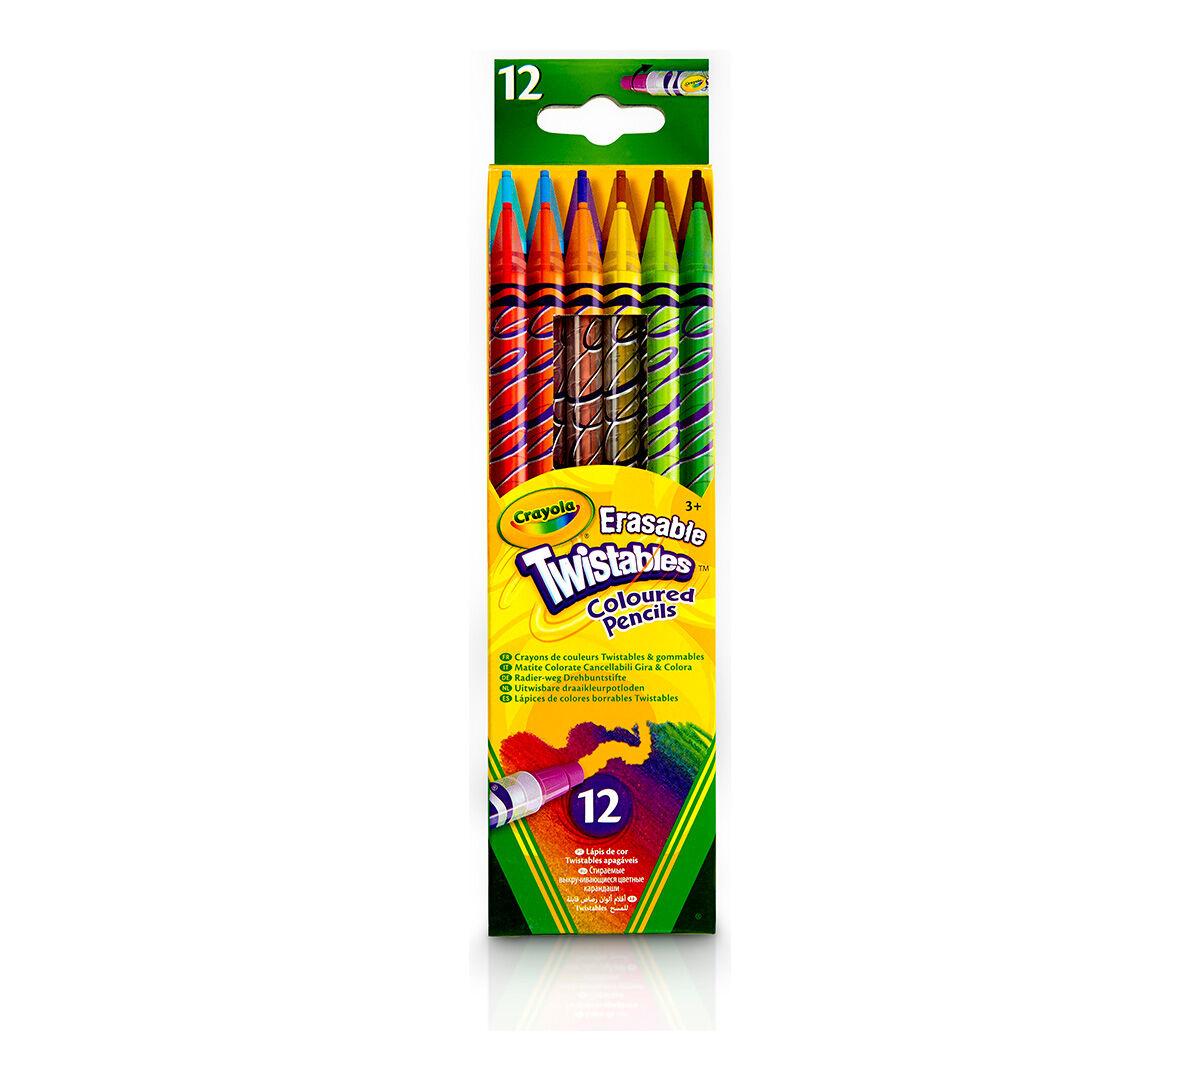 erasable twistables colored pencils 12 count - Crayola Colored Pencils Twistables